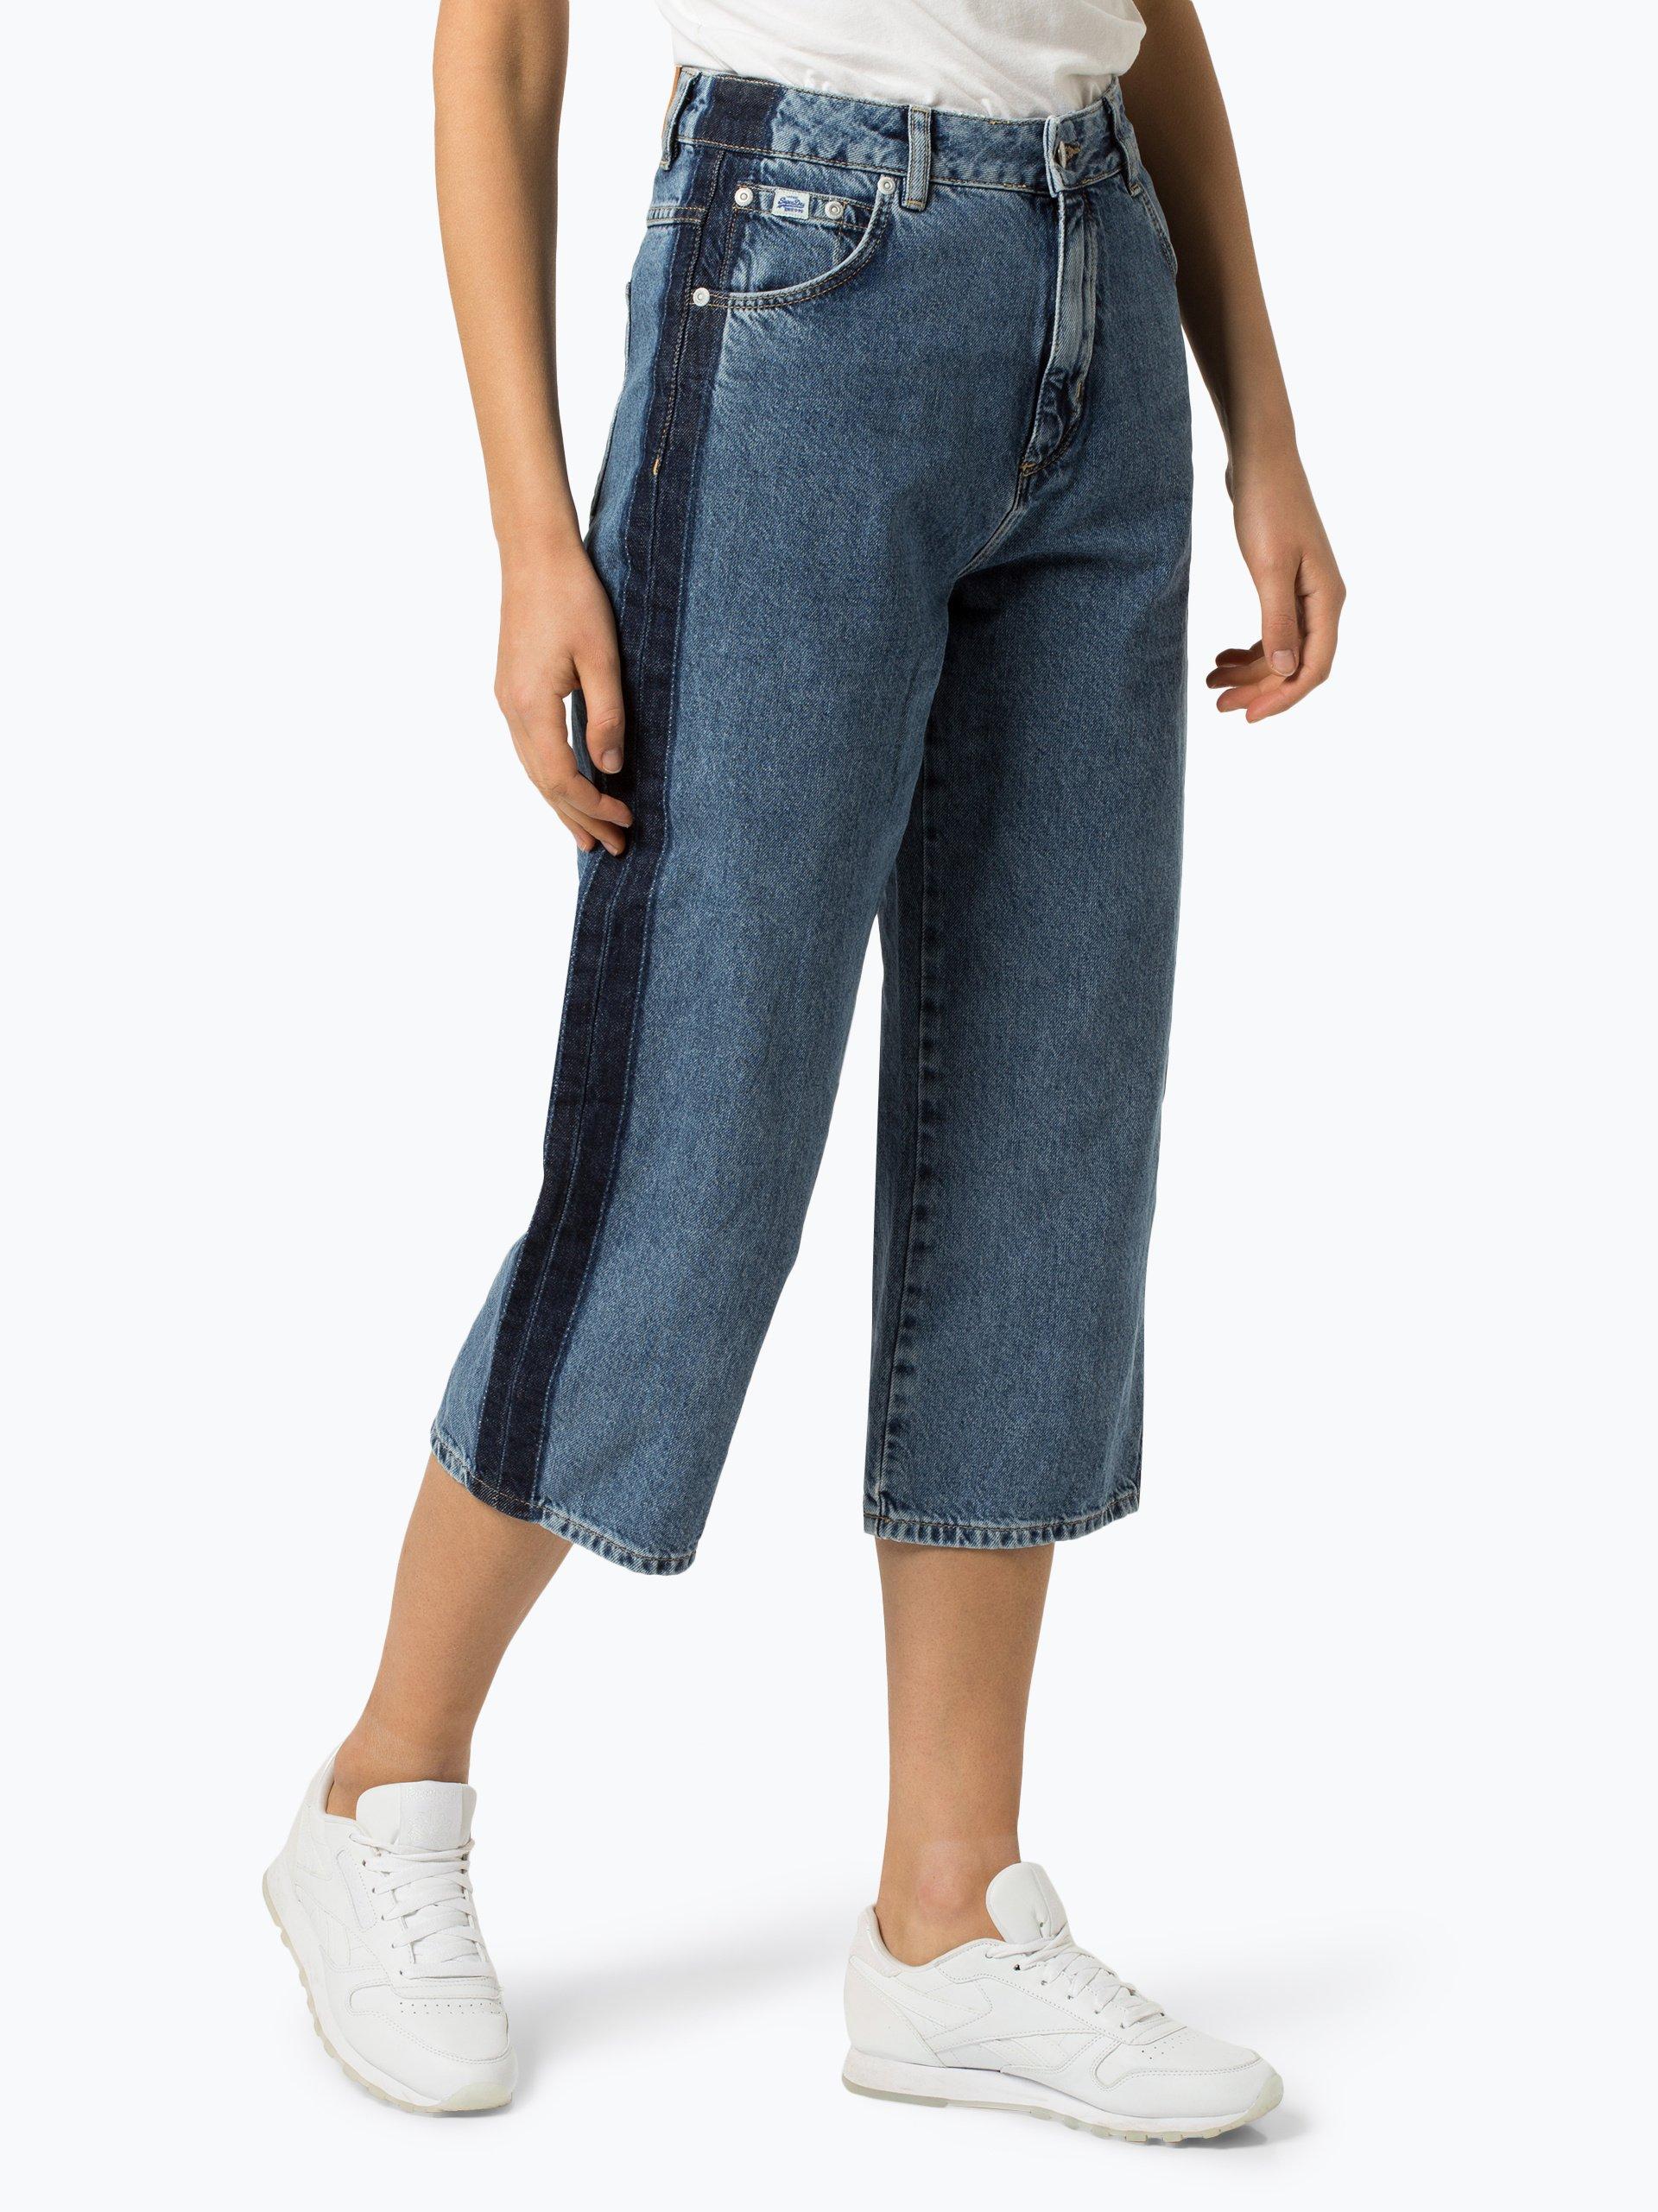 Superdry Damen Jeans - Phoebe